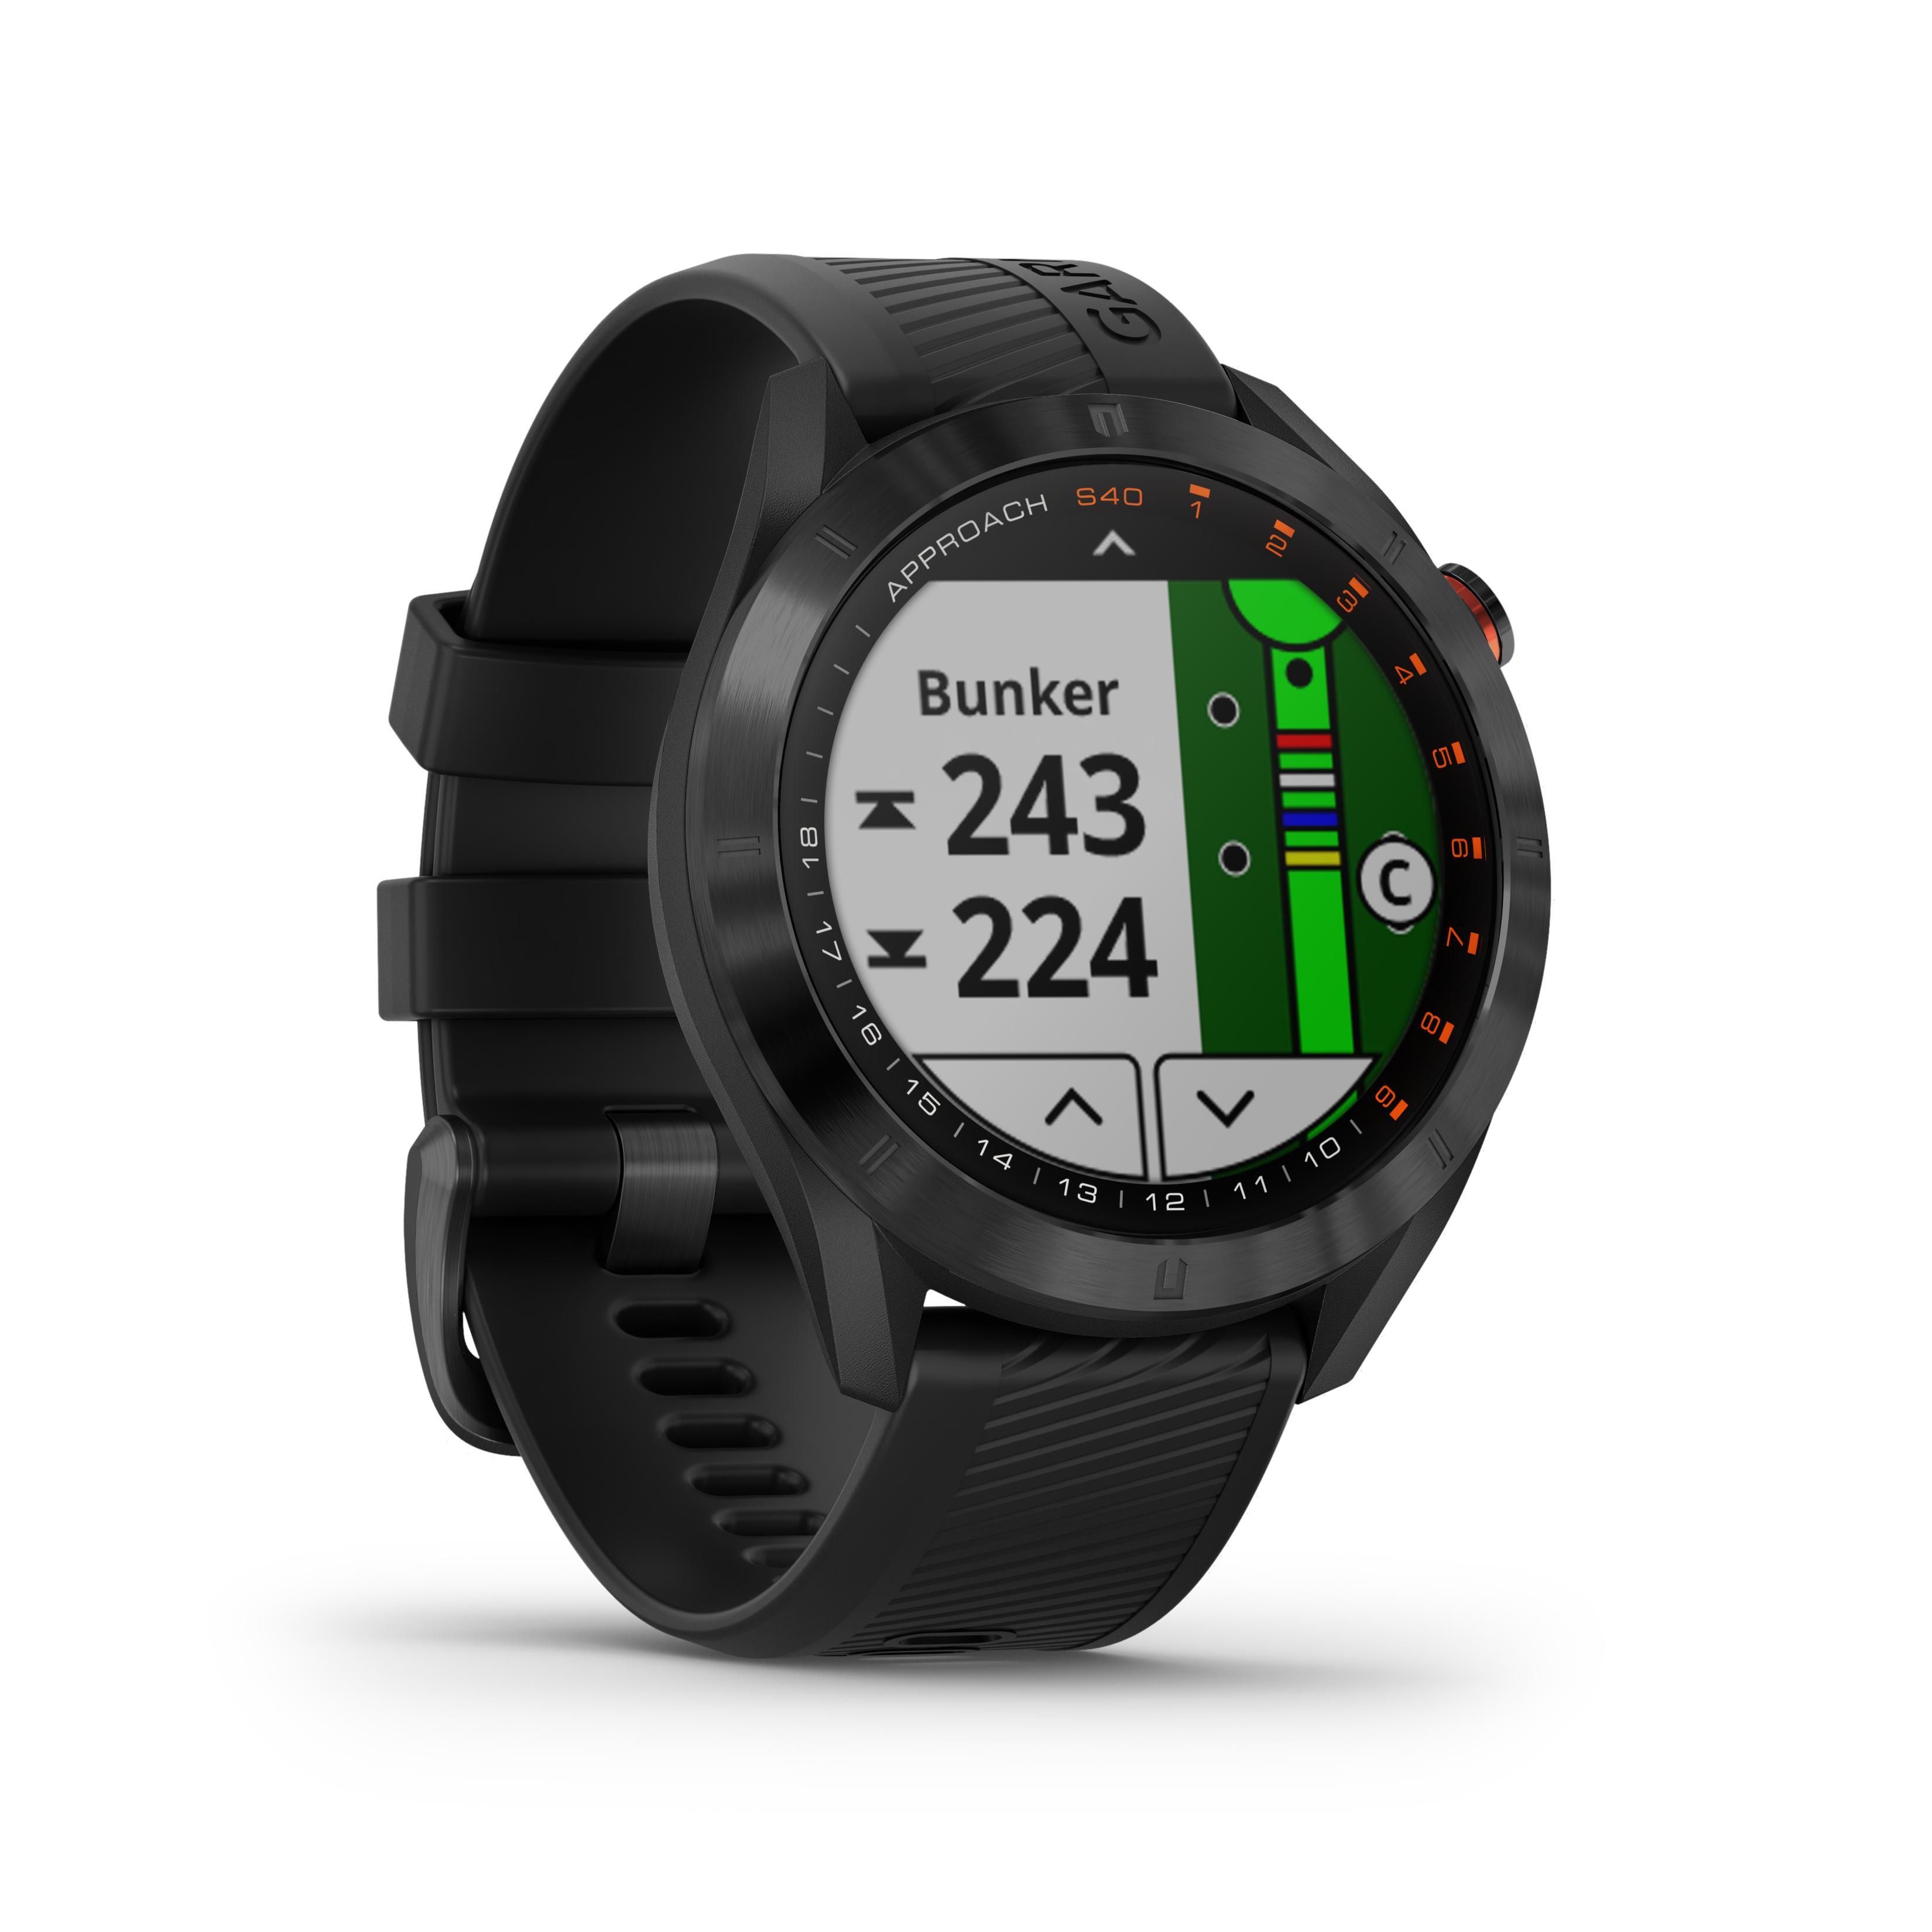 Ceas GPS Approach S40 Premium imagine